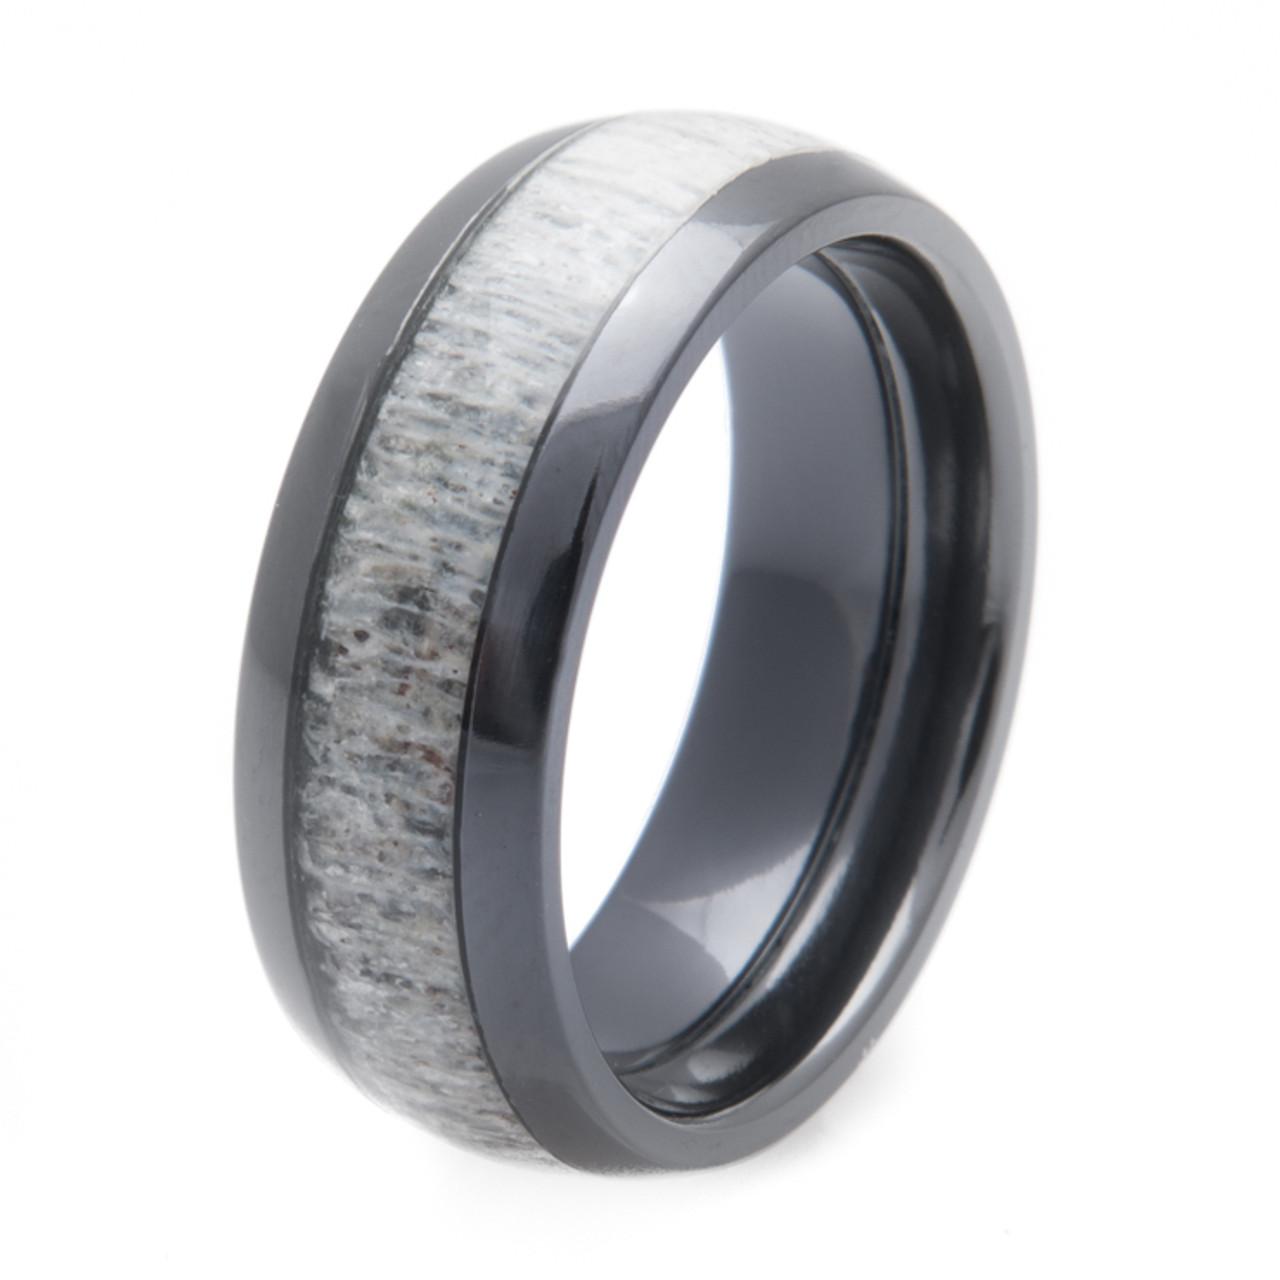 Antler Wedding Ring | Black Zirconium Deer Antler Inlay Ring Titanium Buzz